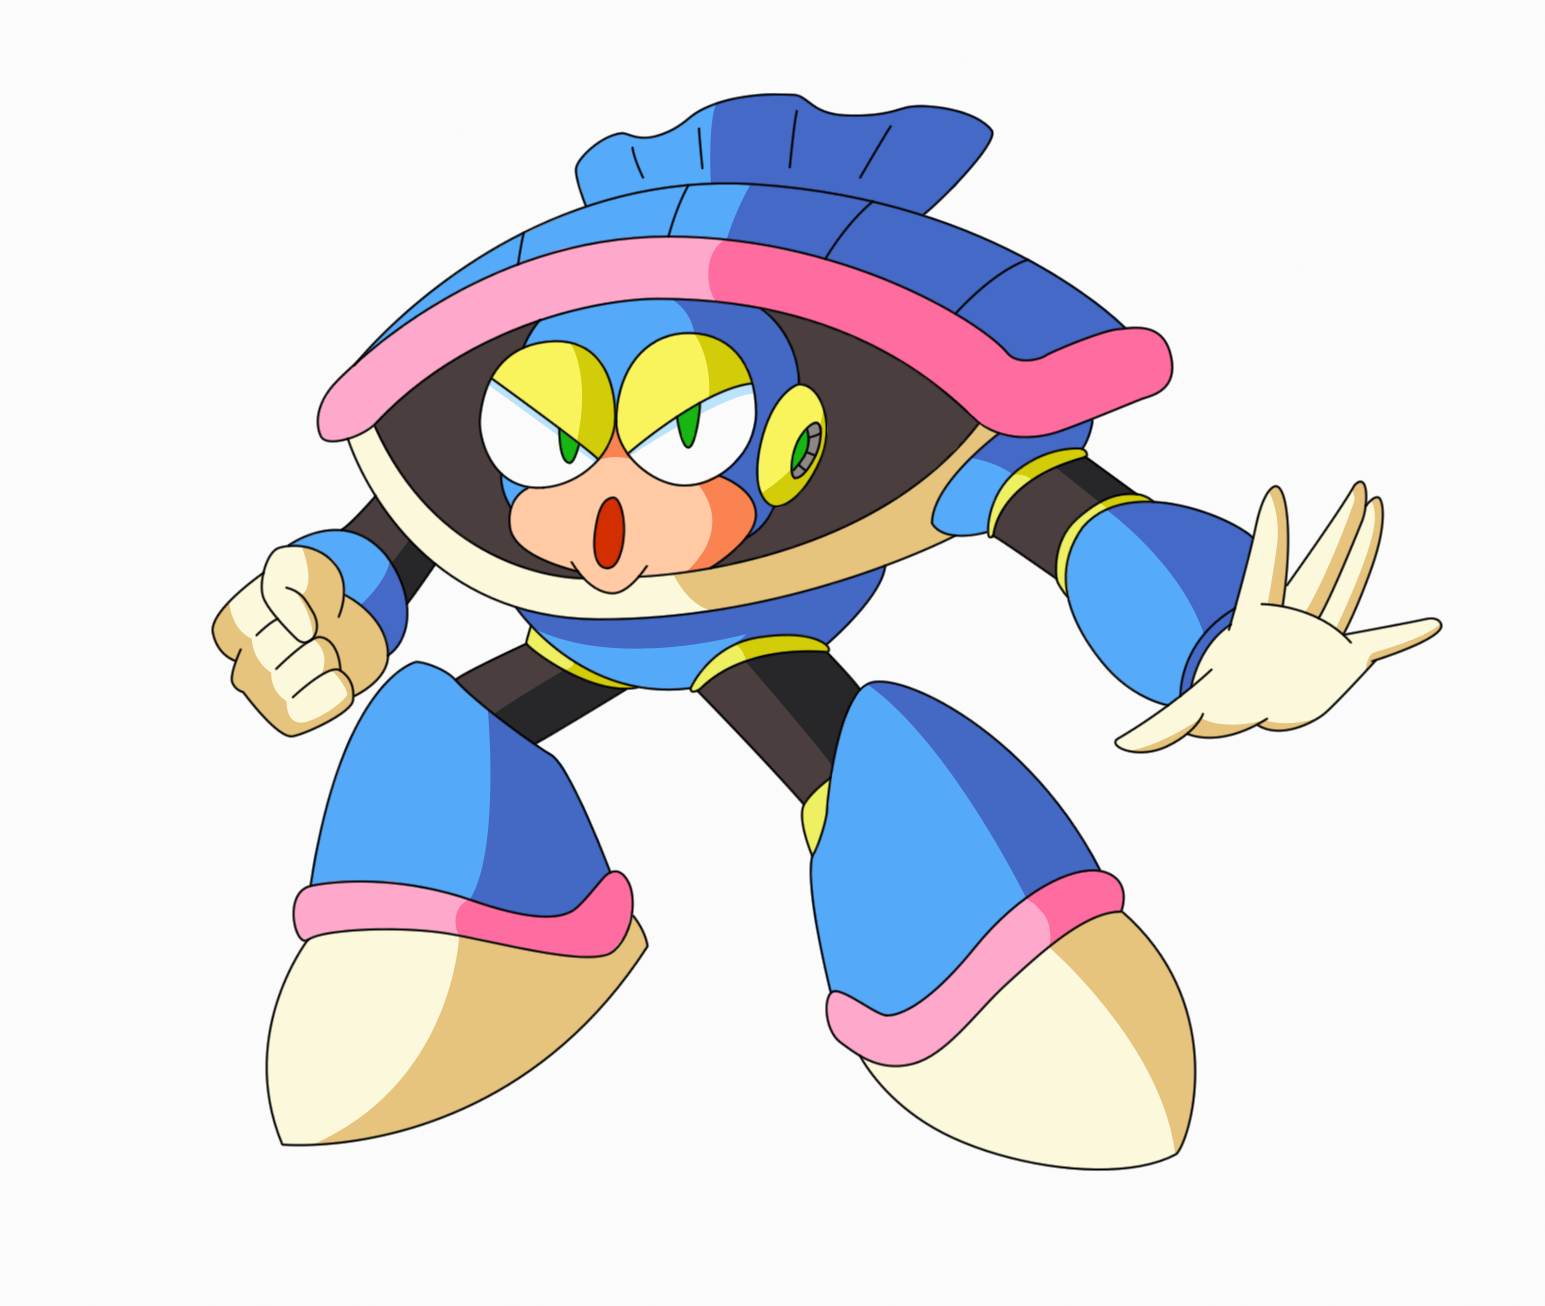 Original: Shell Man by DuoDynamo